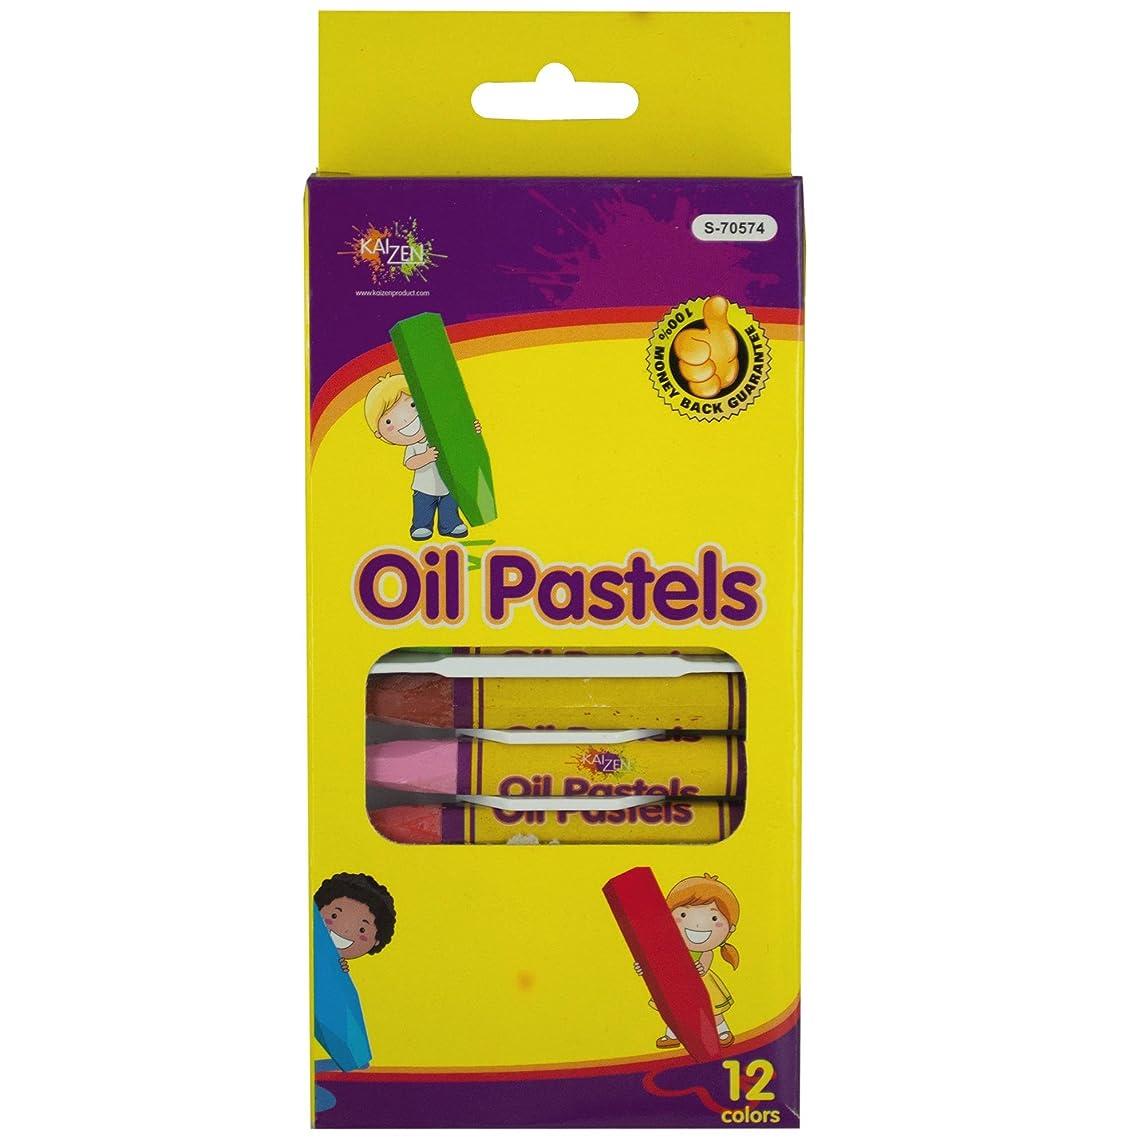 Kole Imports Kole Oil Pastels Set, Multi